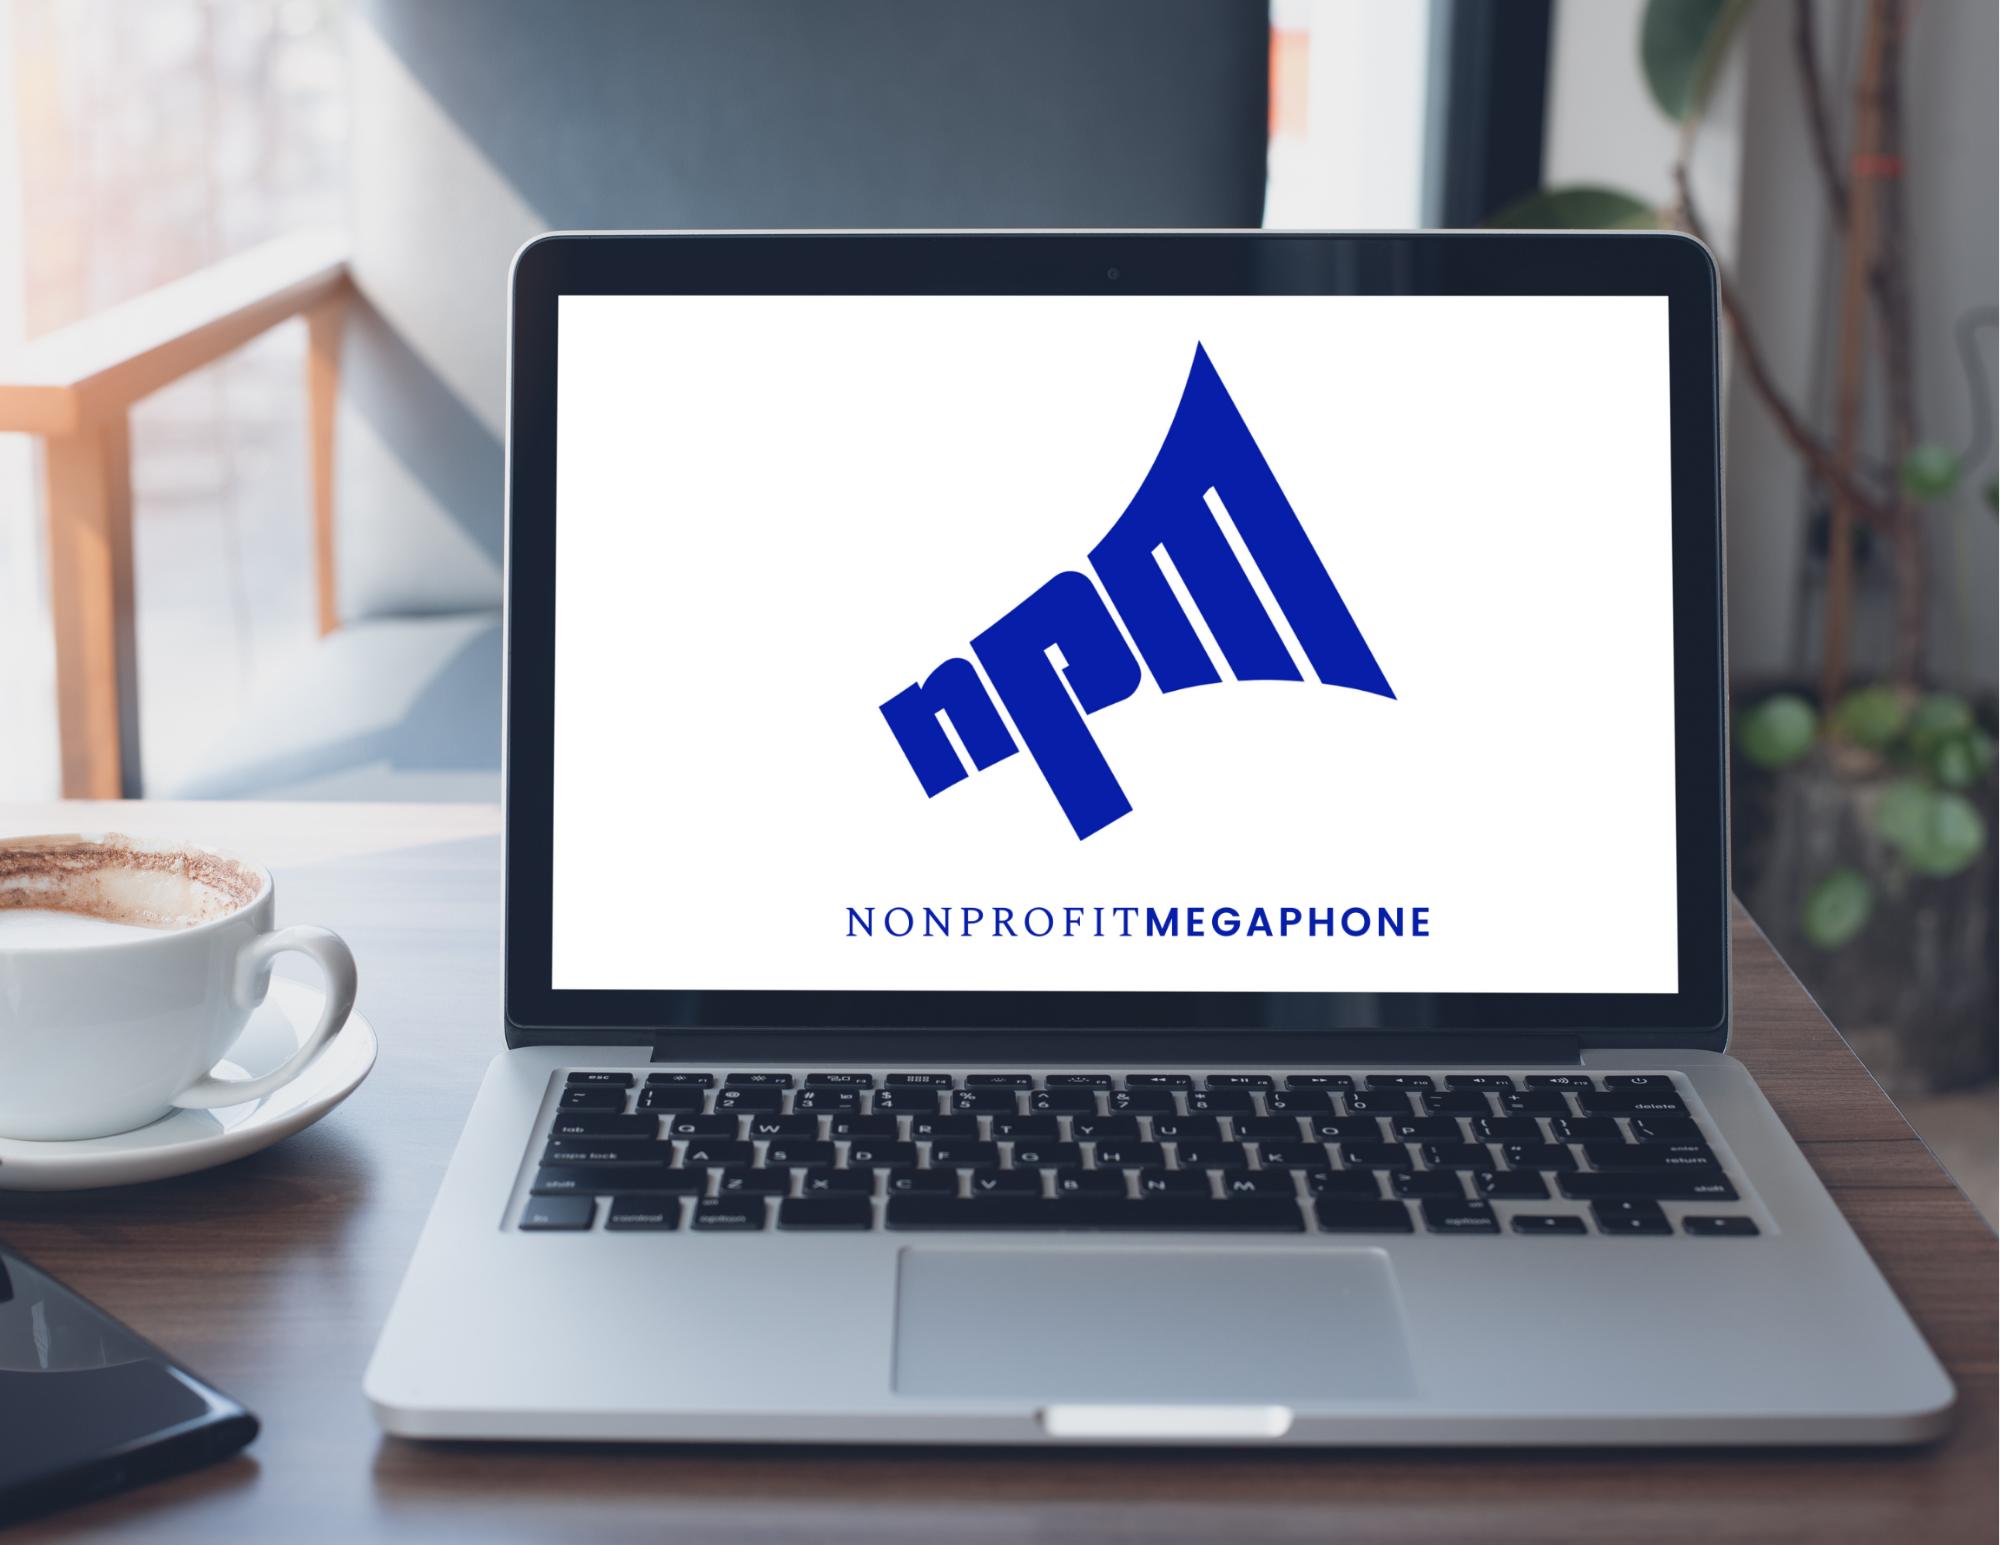 NPM logo on laptop